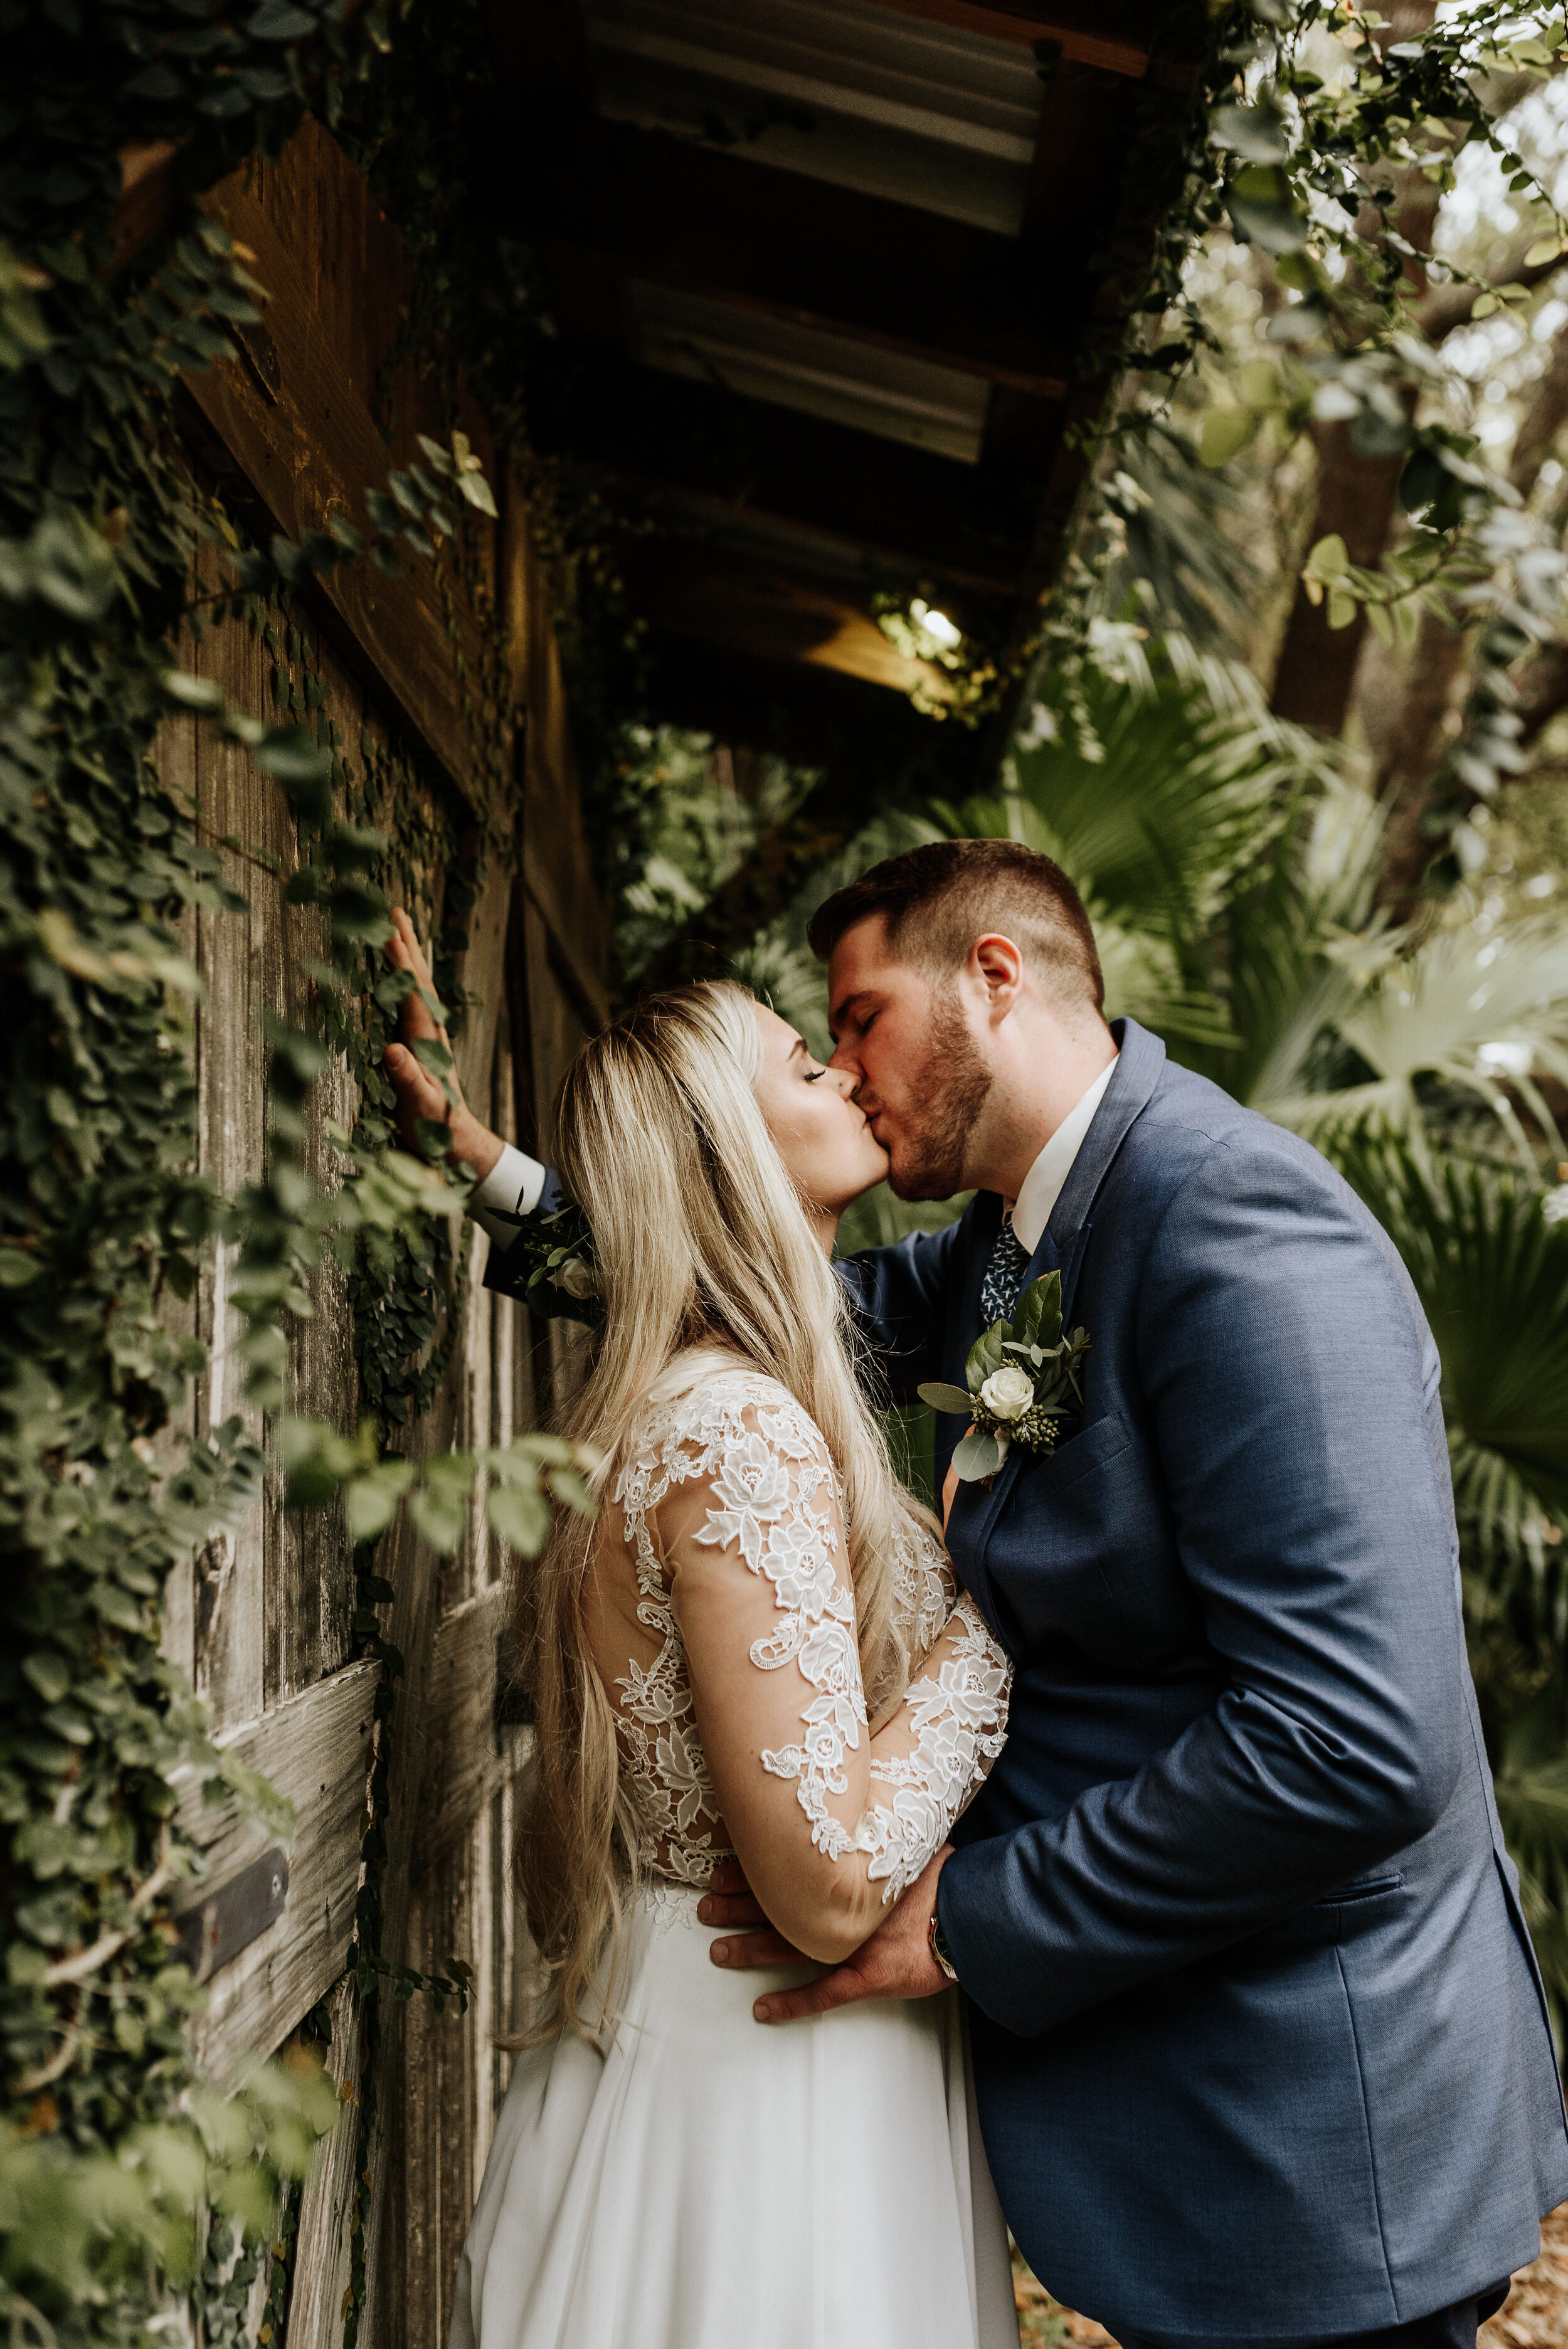 Mikenzi_Brad_Wedding_The_Delamater_House_New_Smyrna_Beach_Florida_Photography_by_V_0873.jpg